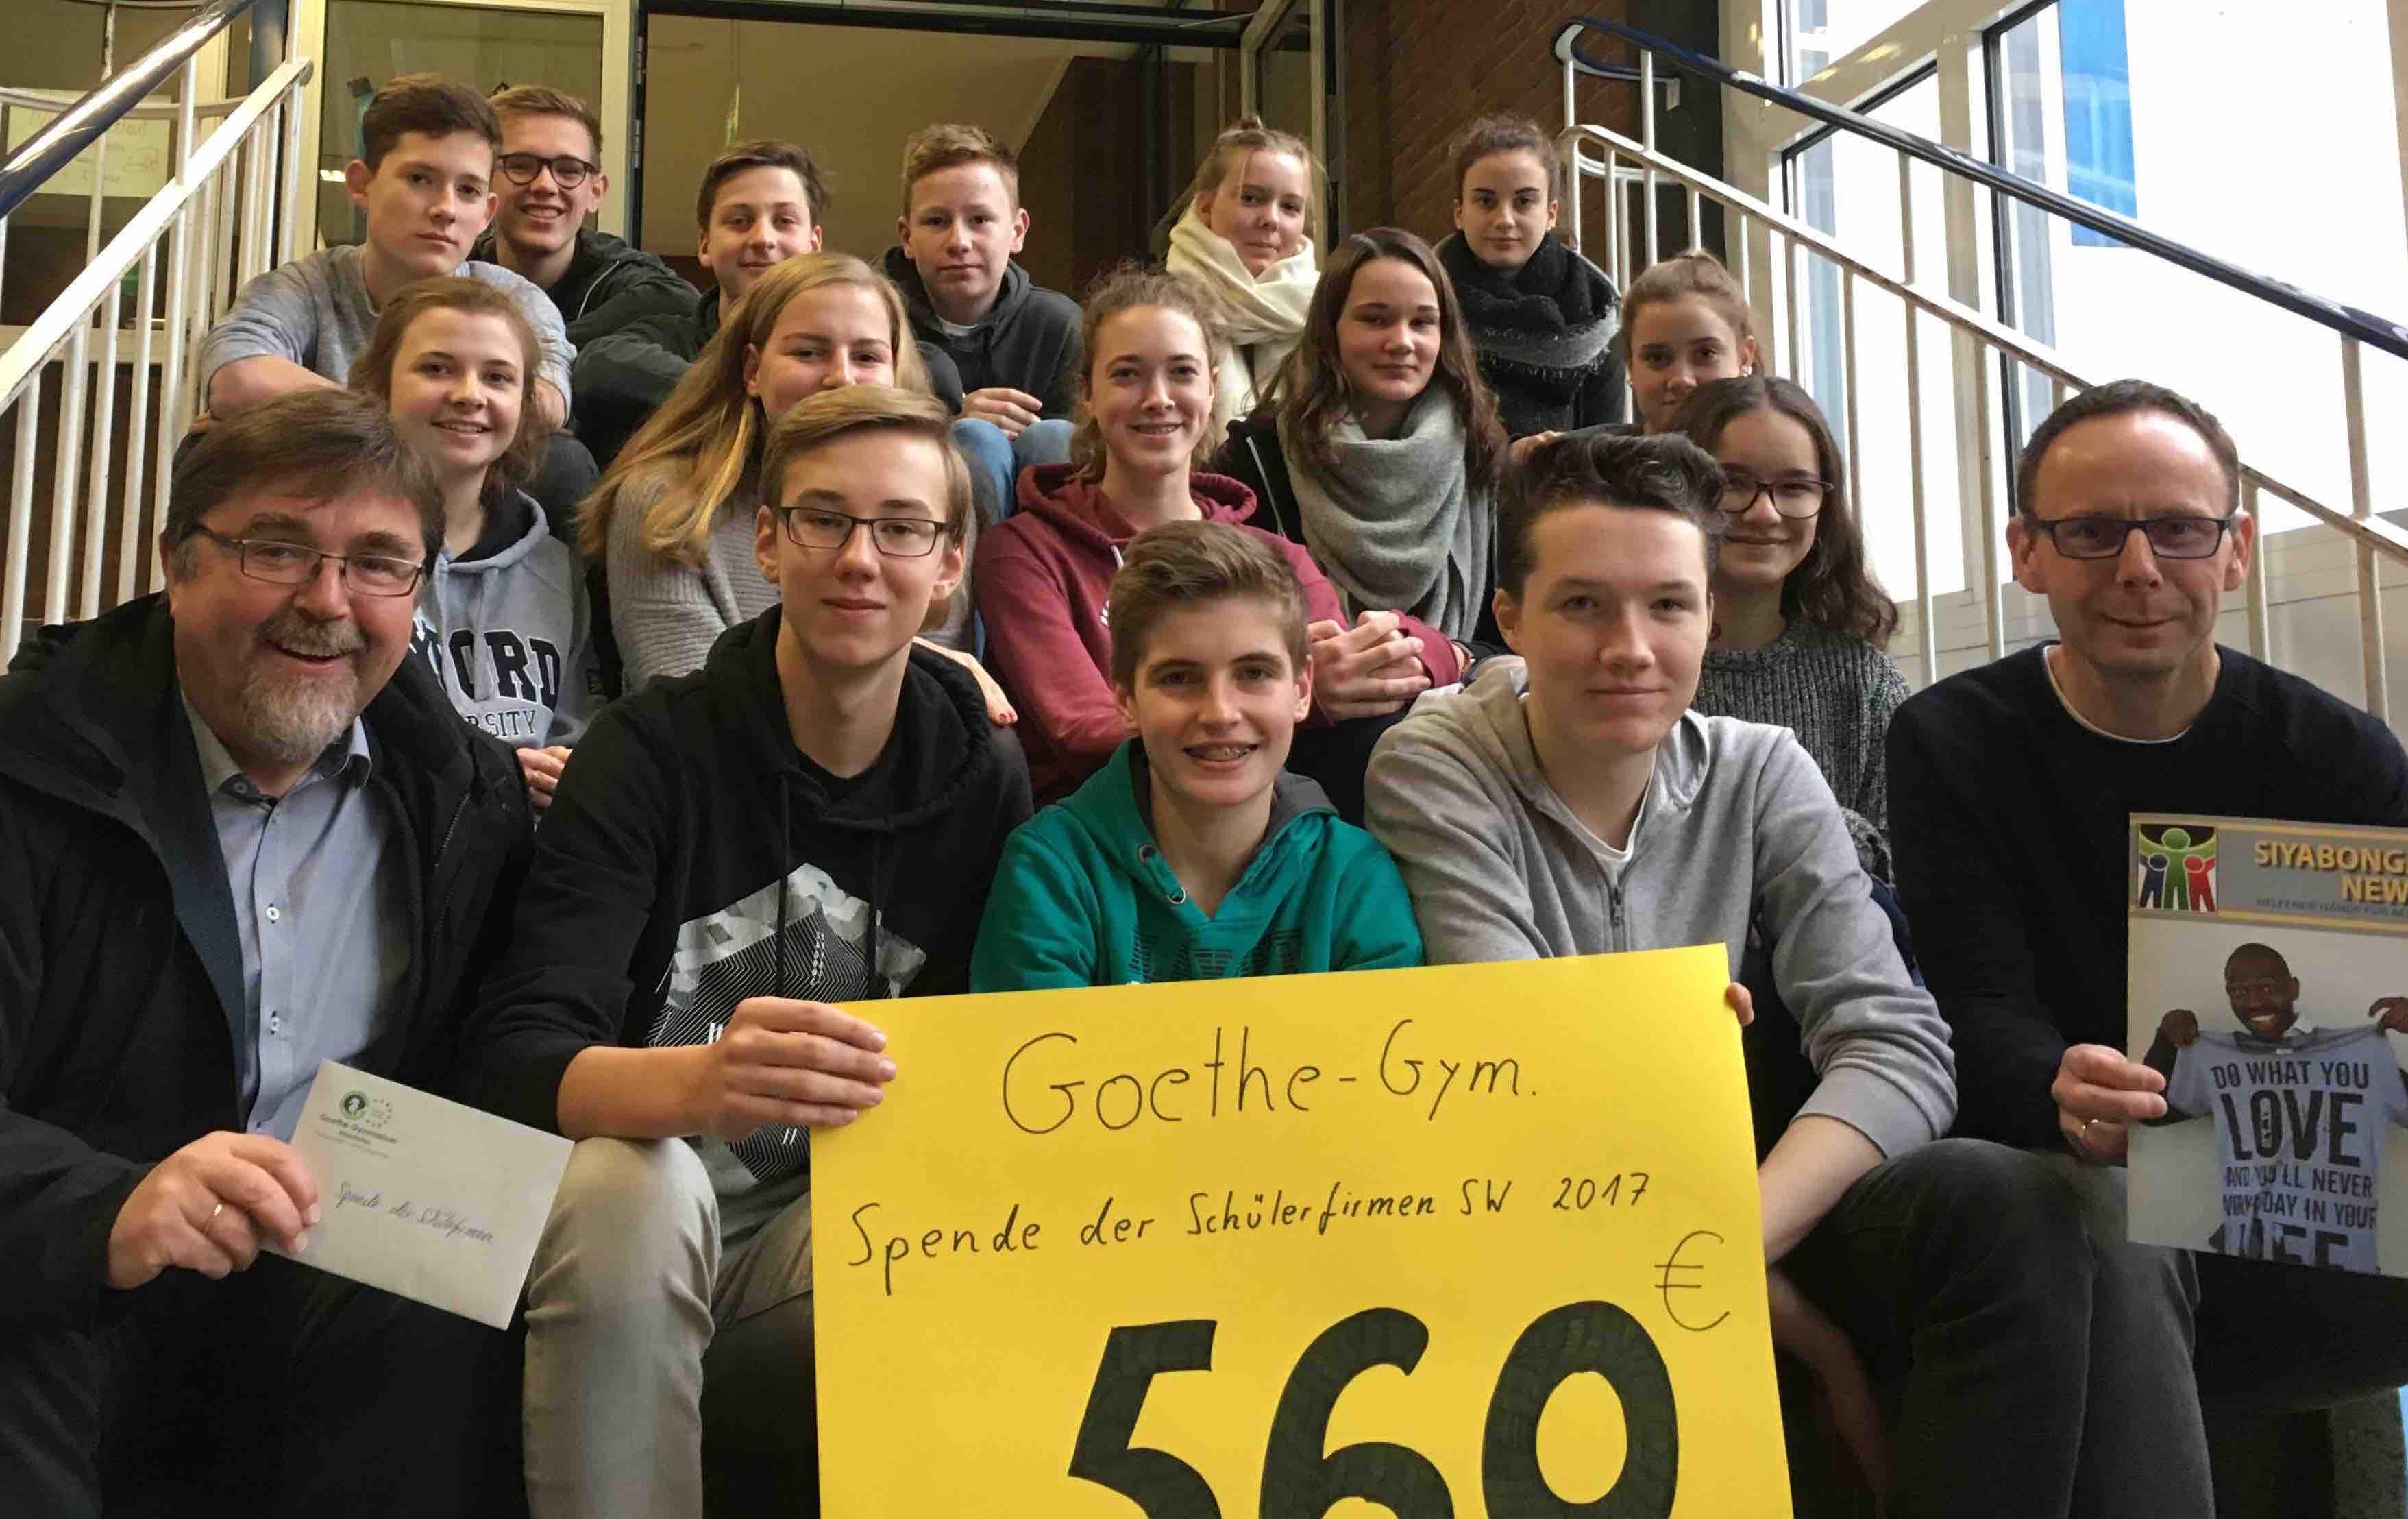 Goethe Schülerfirmen